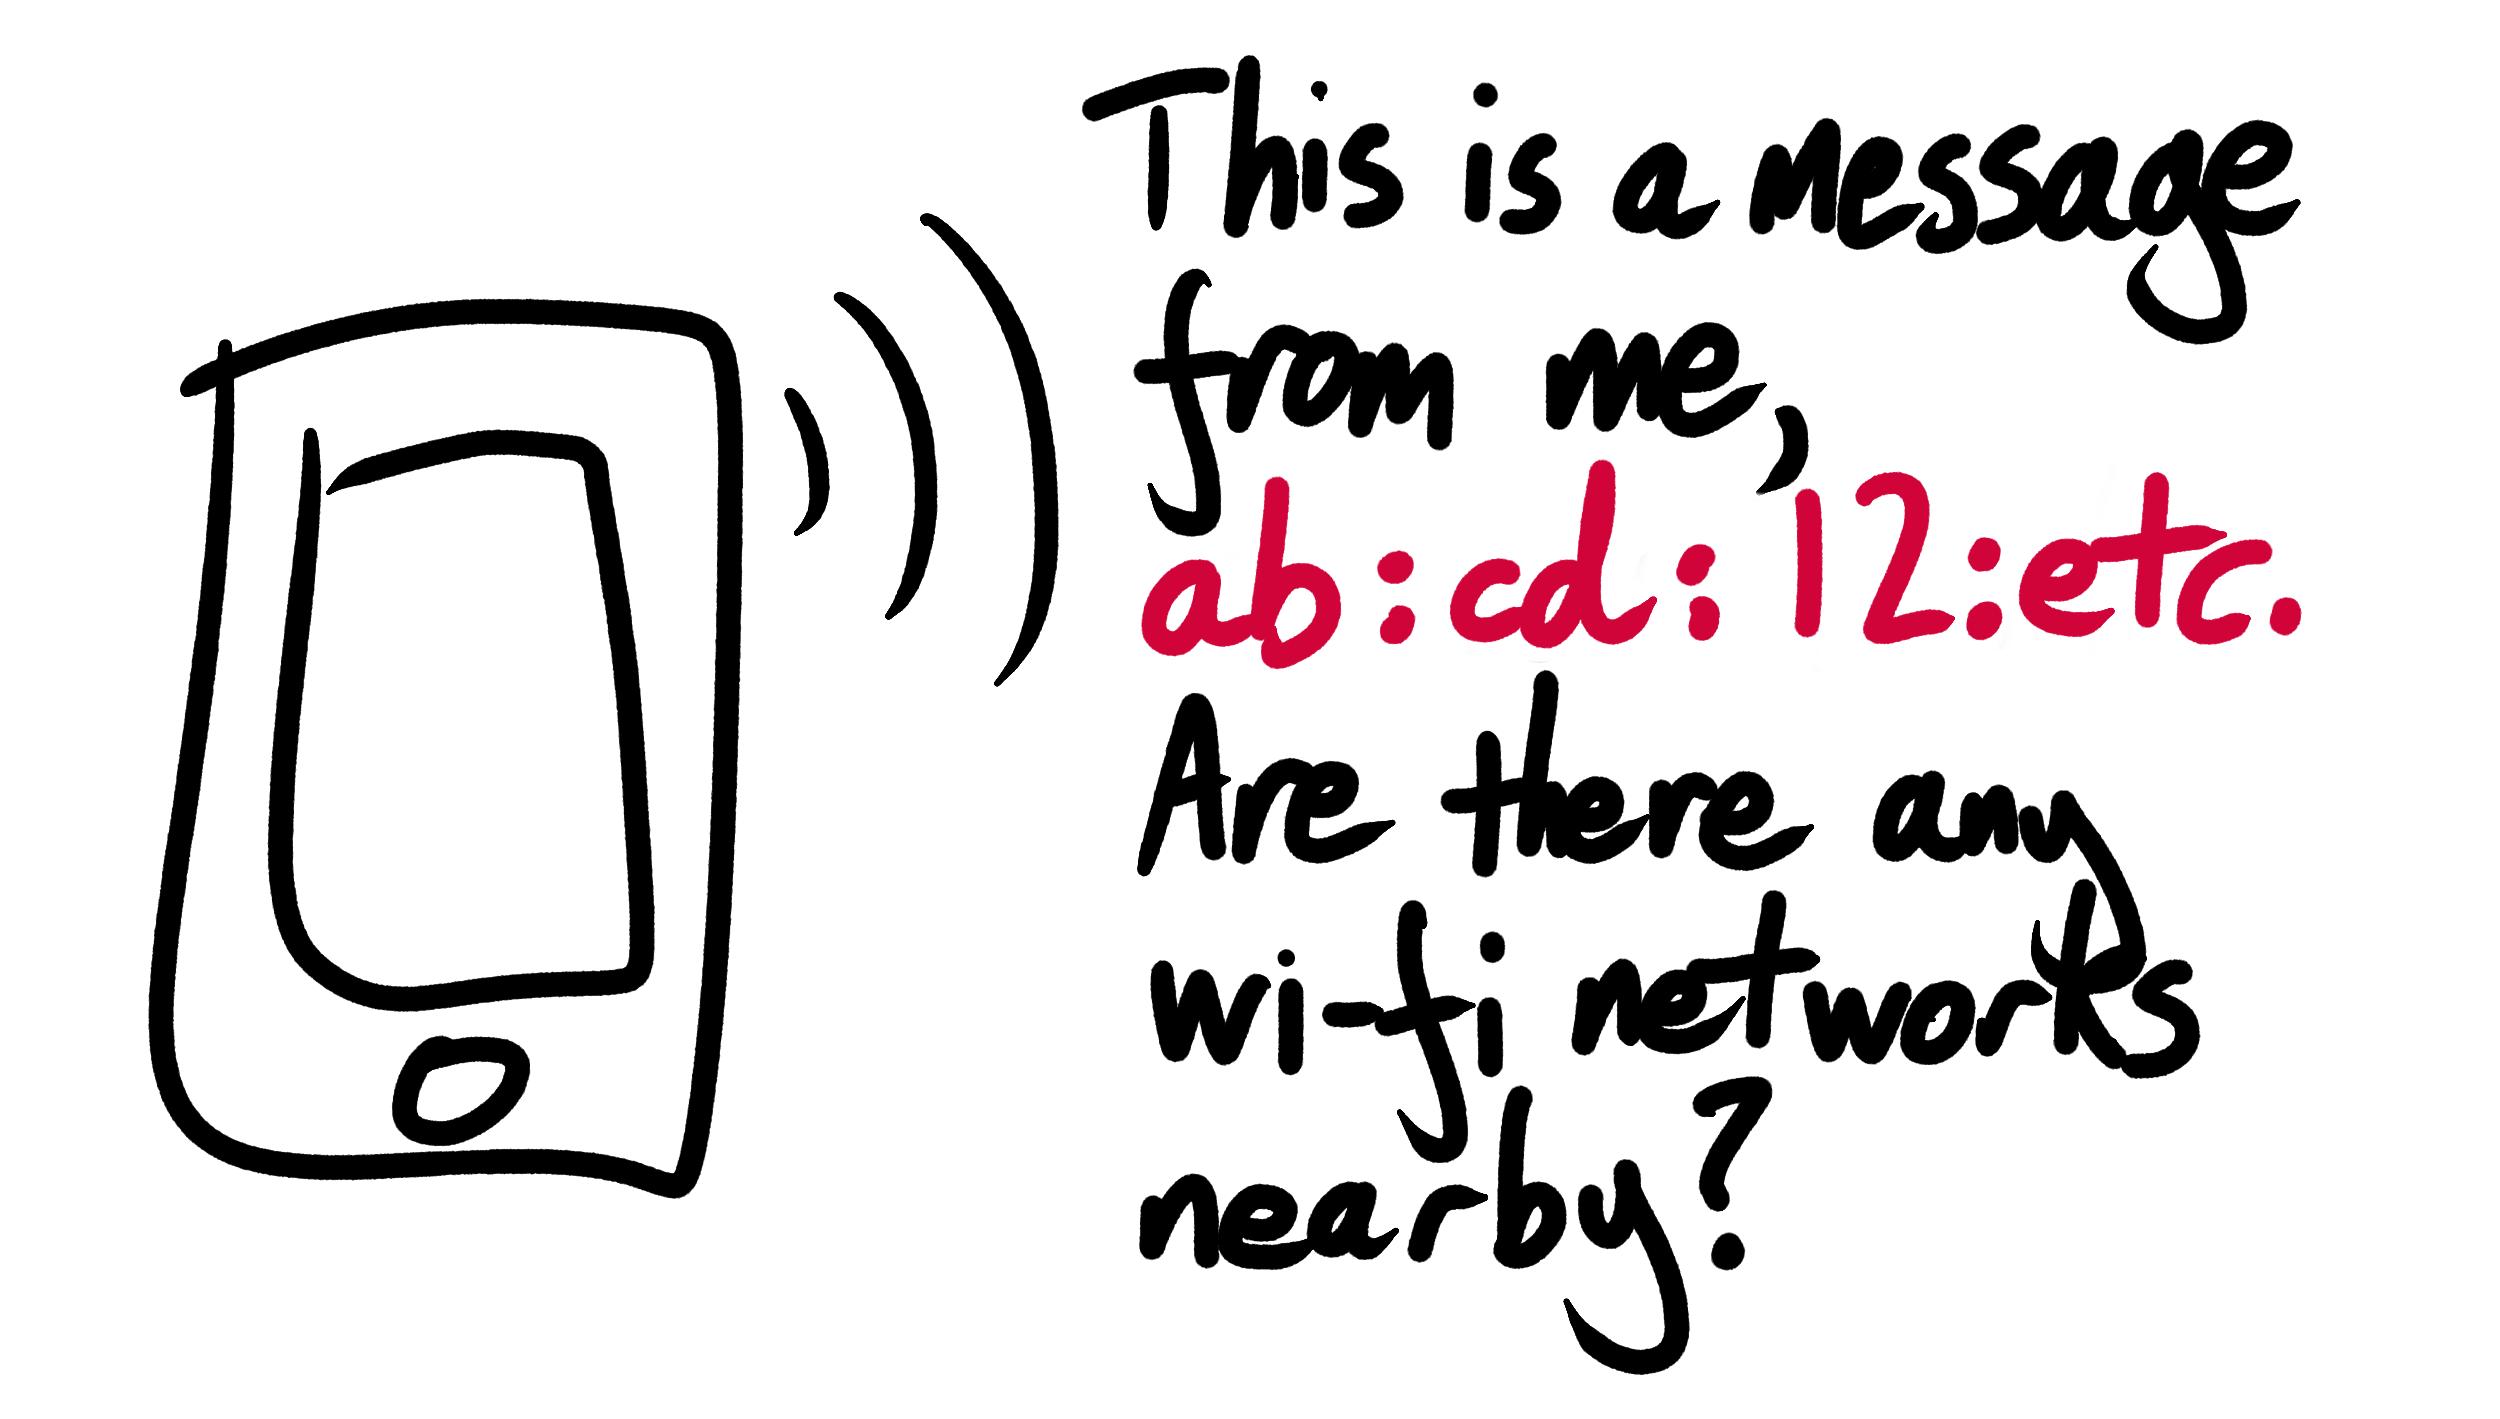 A brief history of wi-fi privacy vulnerabilities | Robert Heaton